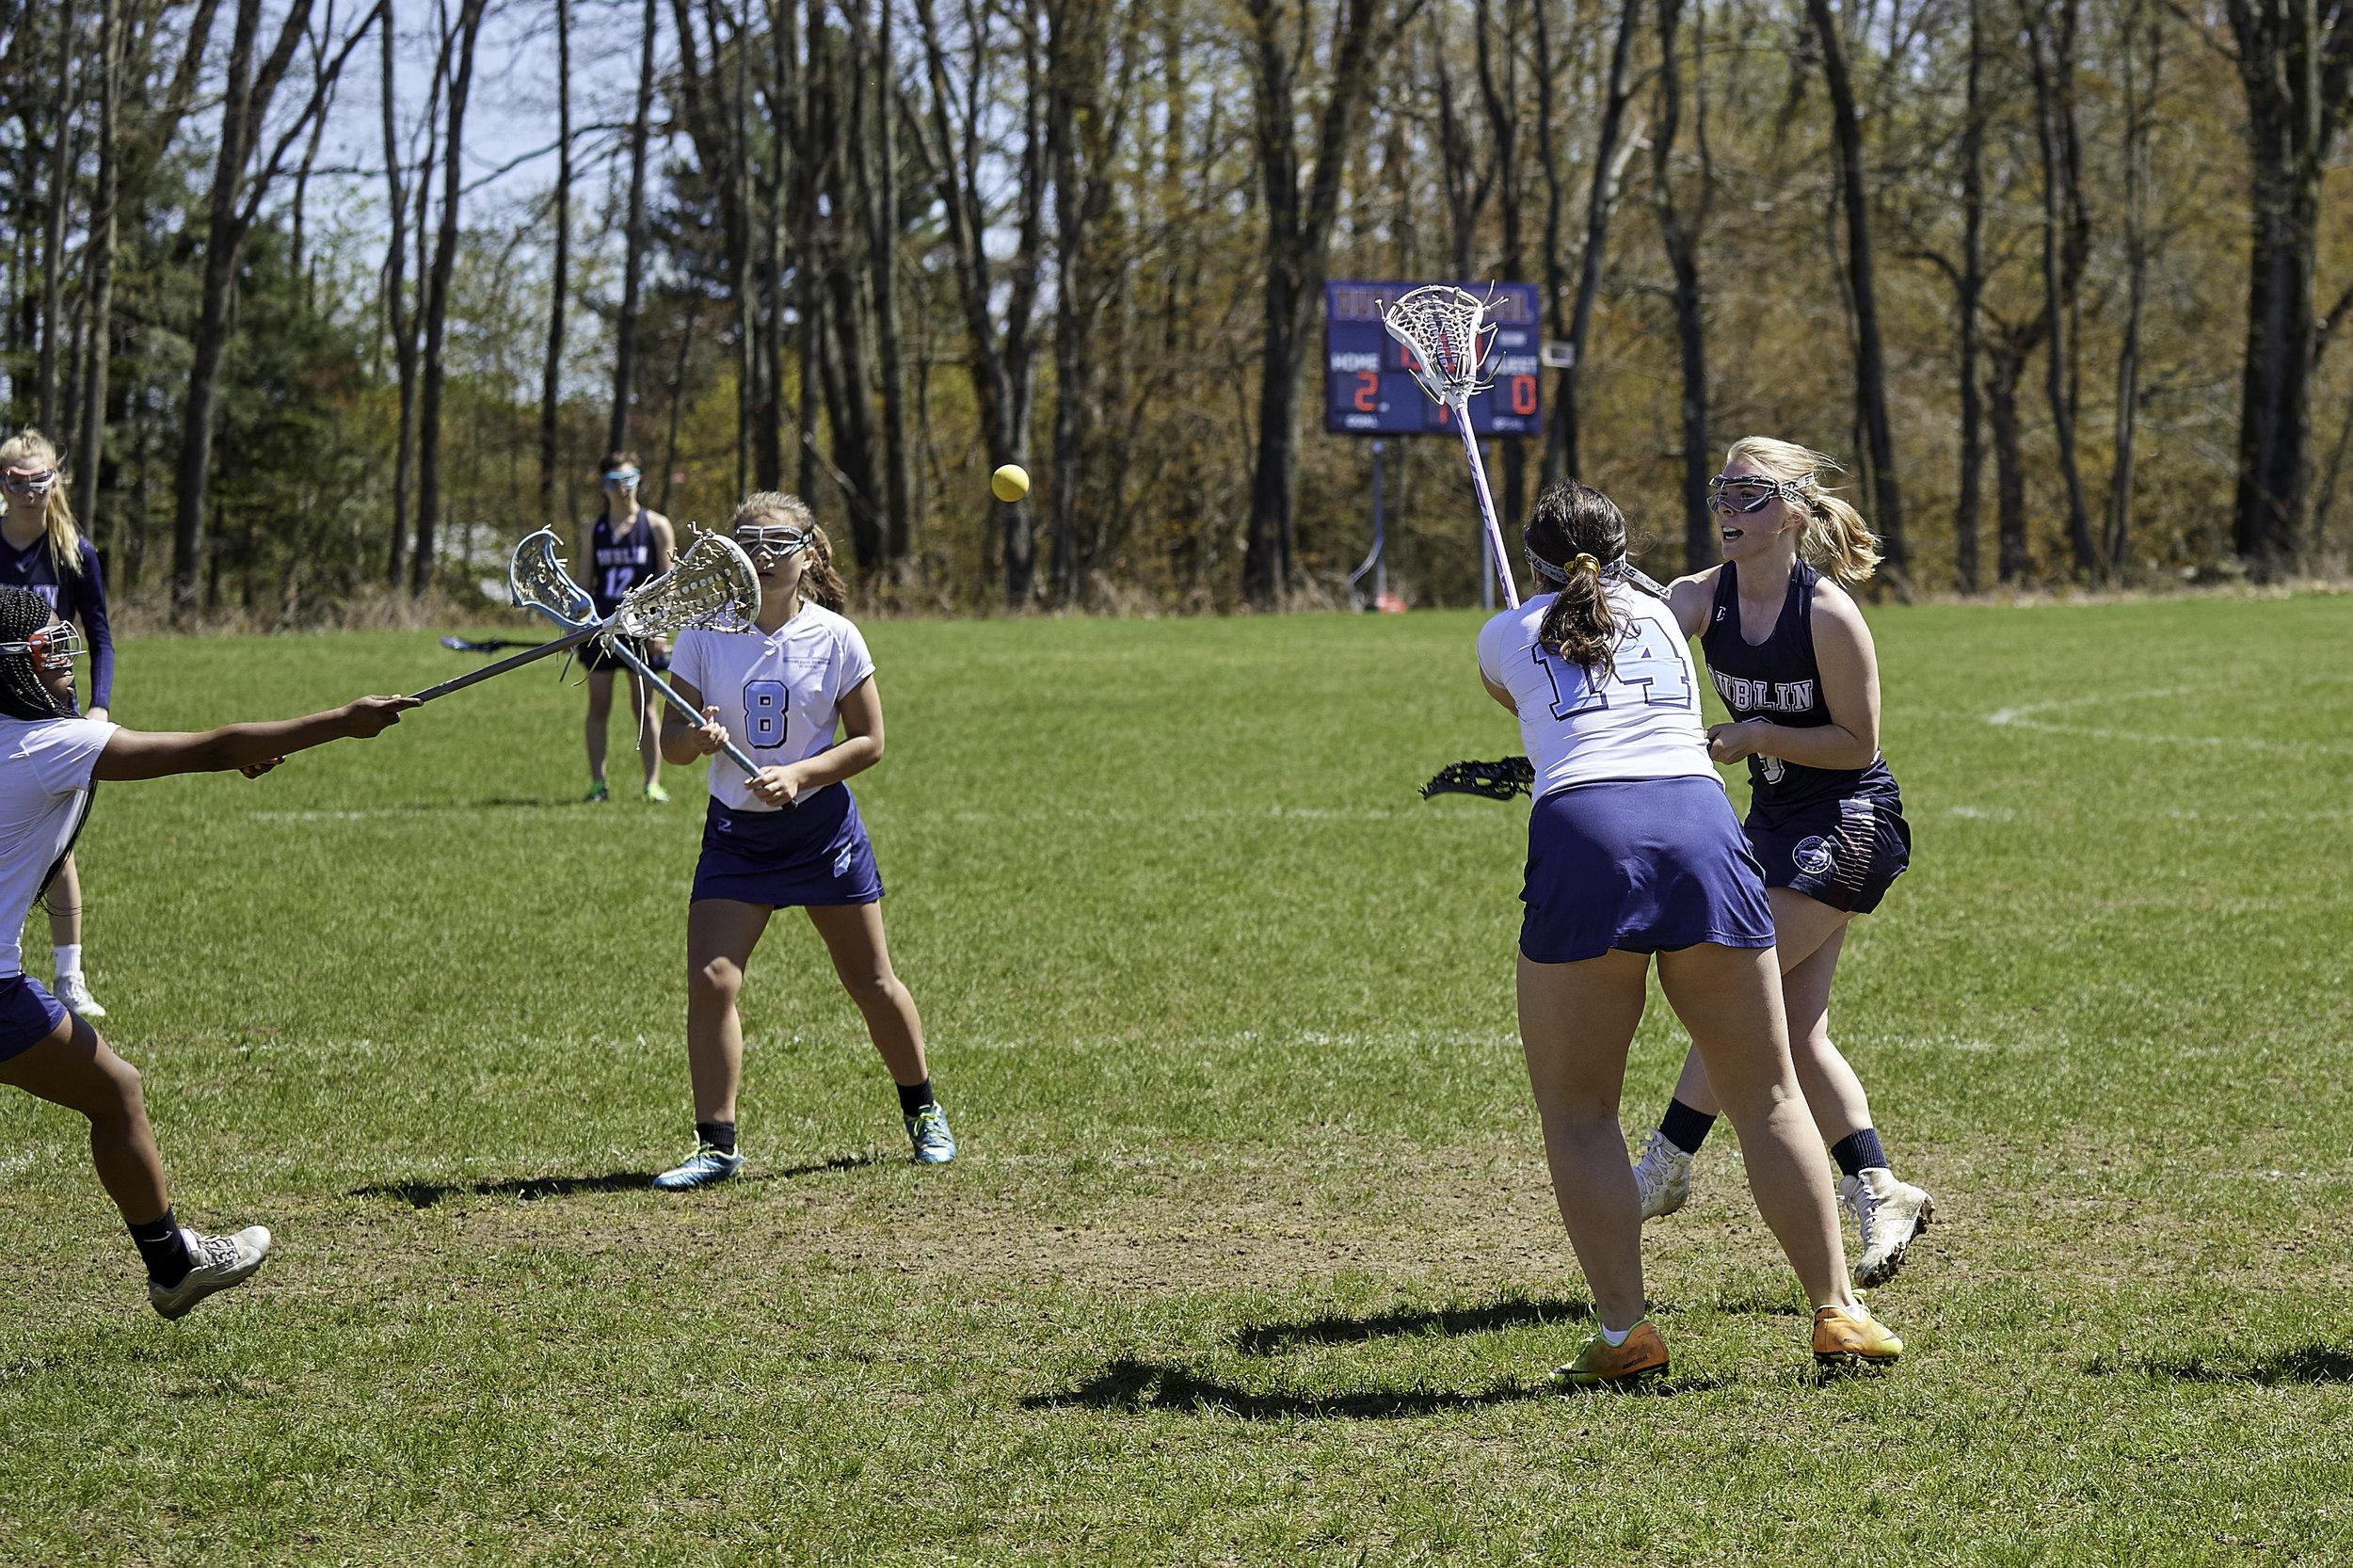 Girls Lacrosse vs. Stoneleigh Burnham School - May 11, 2019 - May 10, 2019193192.jpg